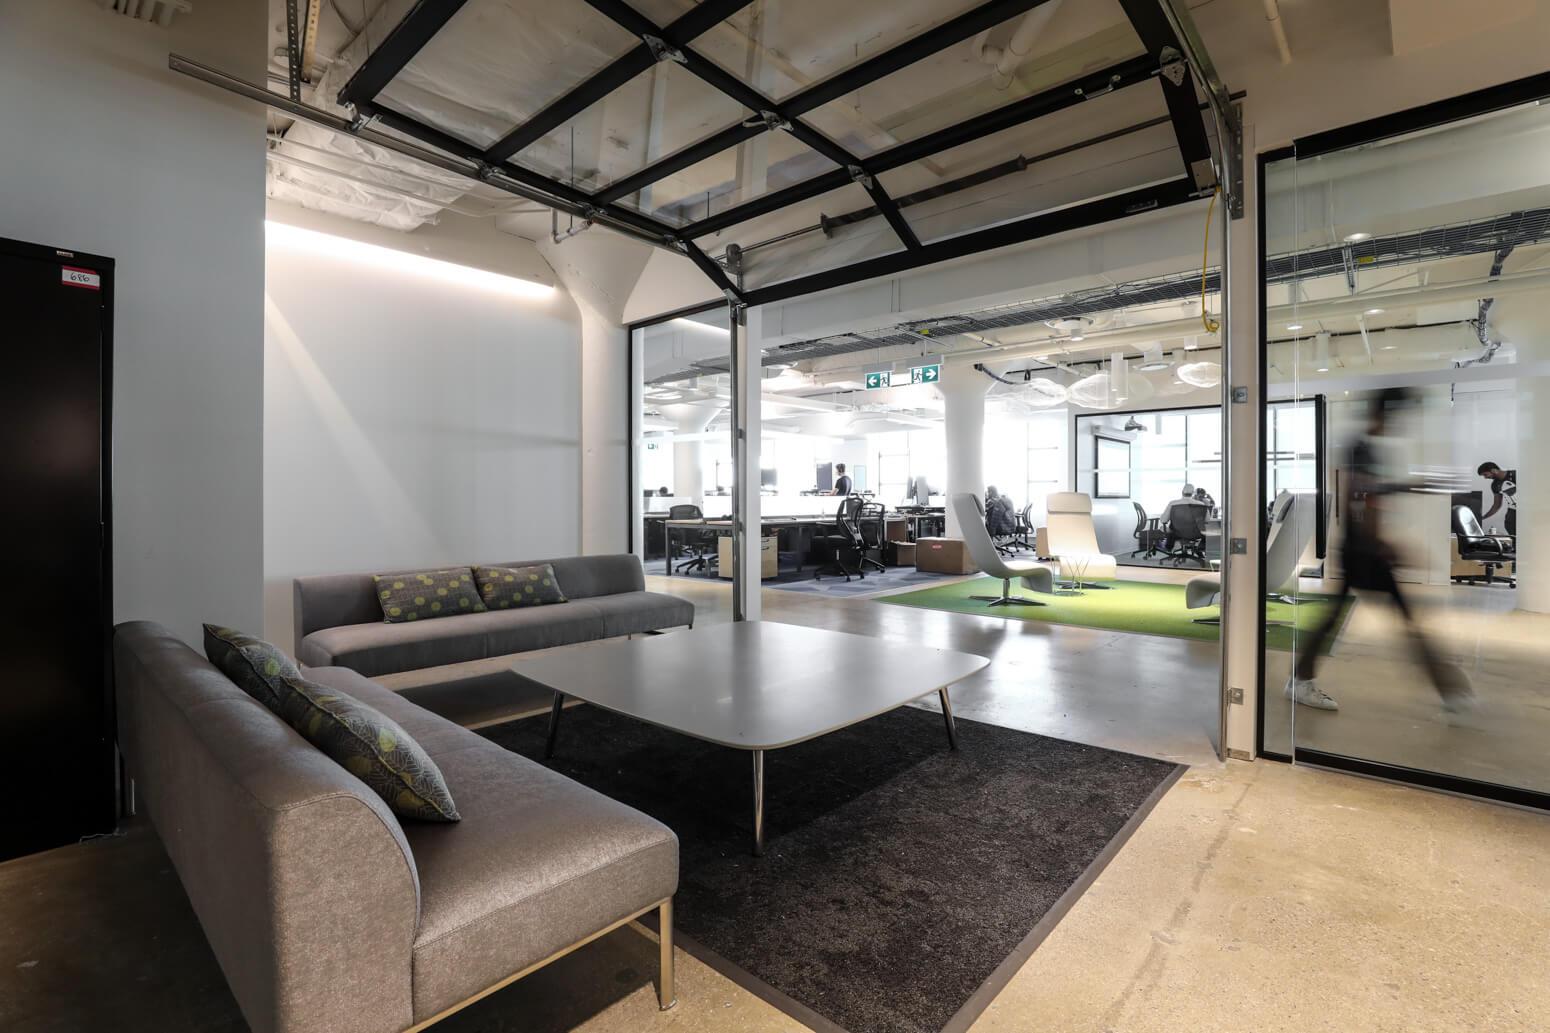 Ecobee Toronto Office Killer Spaces-22